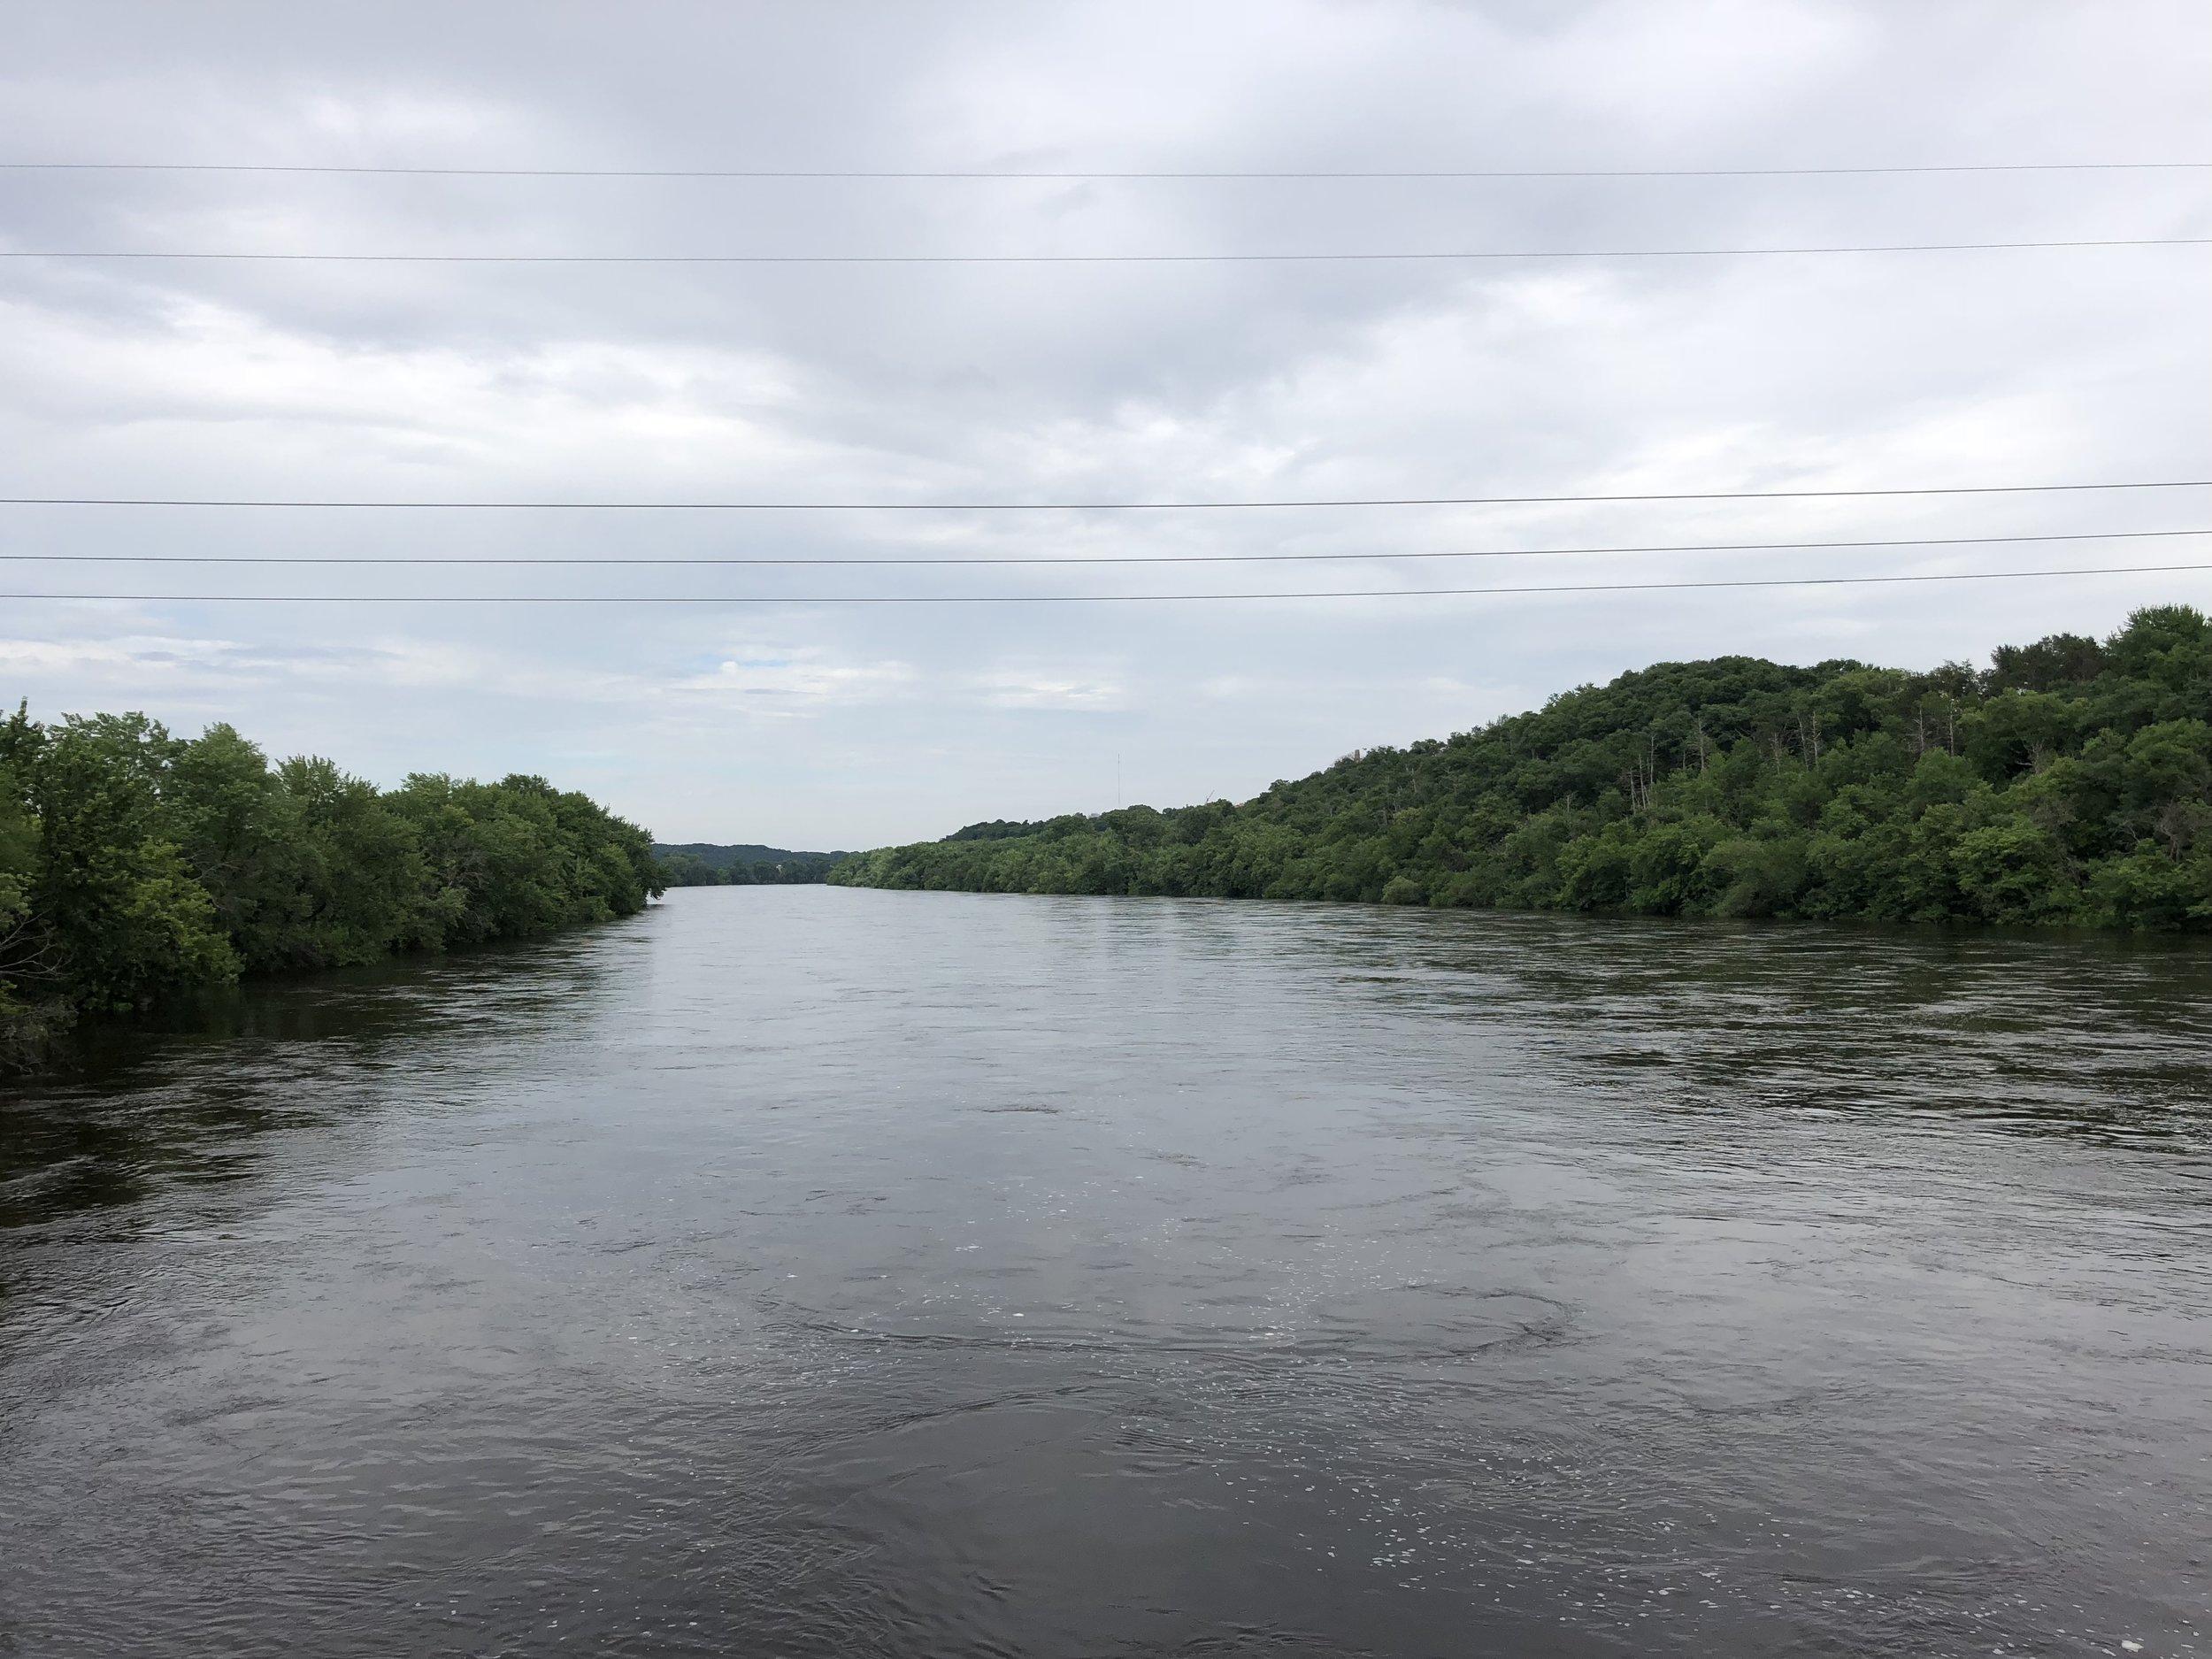 The swollen Chippewa River.